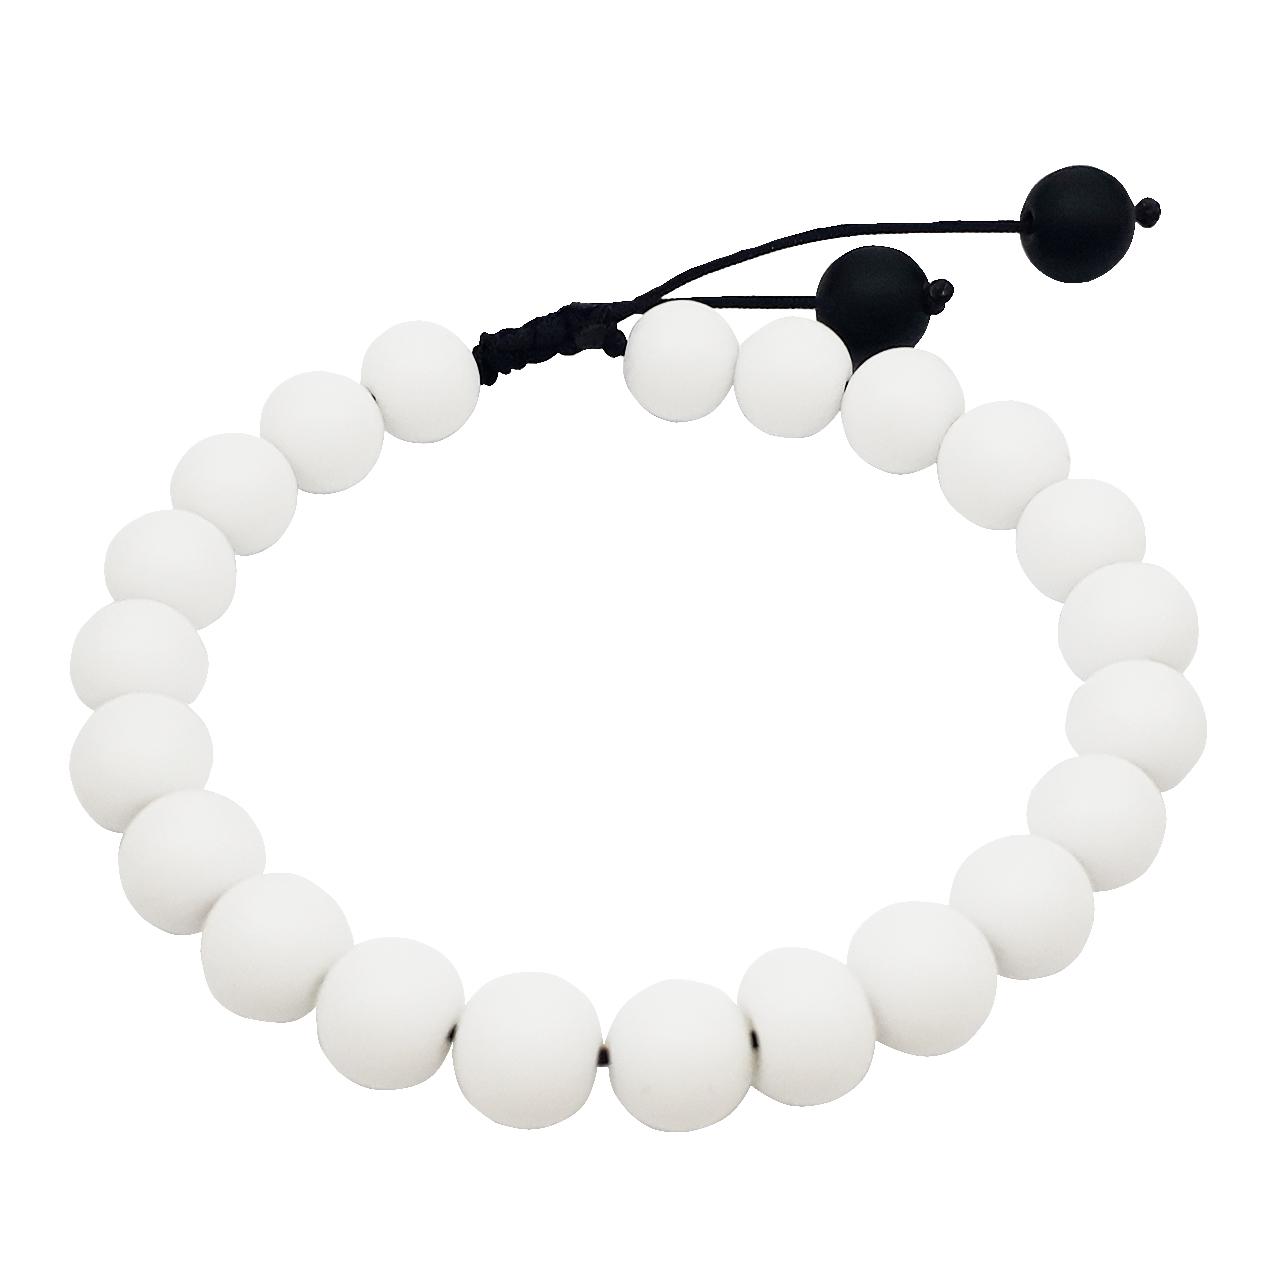 دستبند کد LDK-MH03